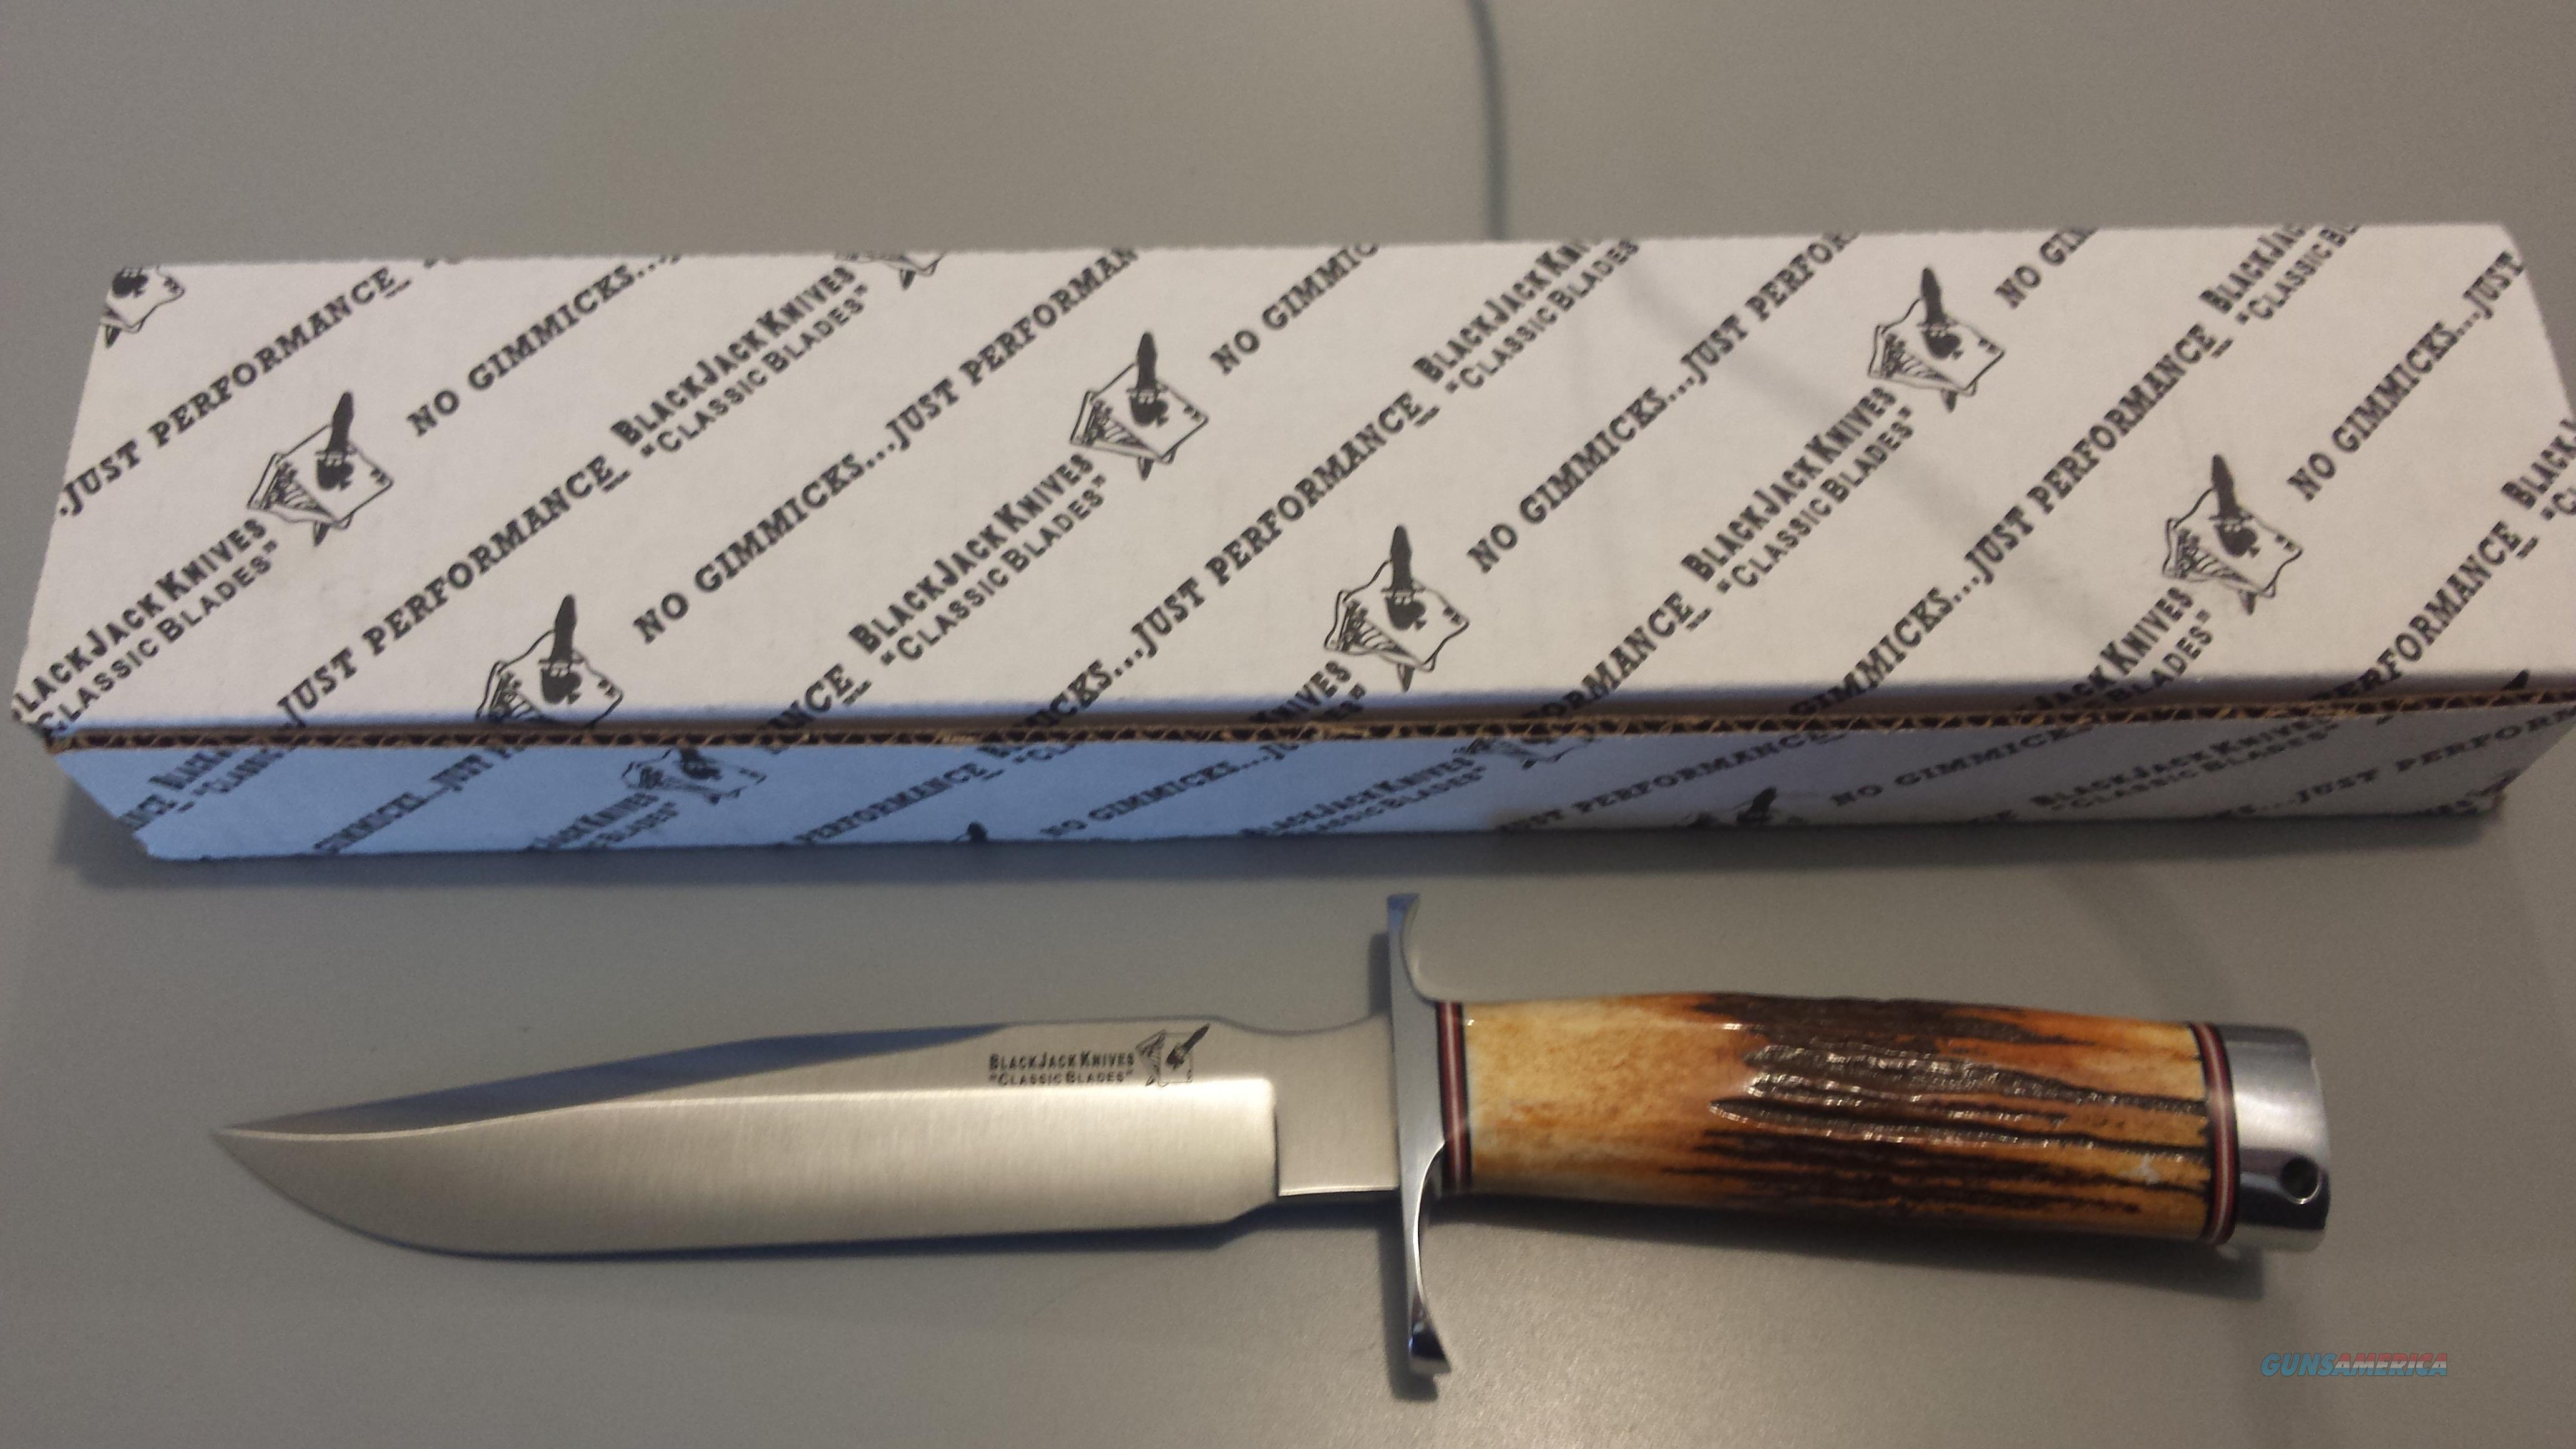 Blackjack knives model 7 stag : Manuale holdem manager 2 italiano